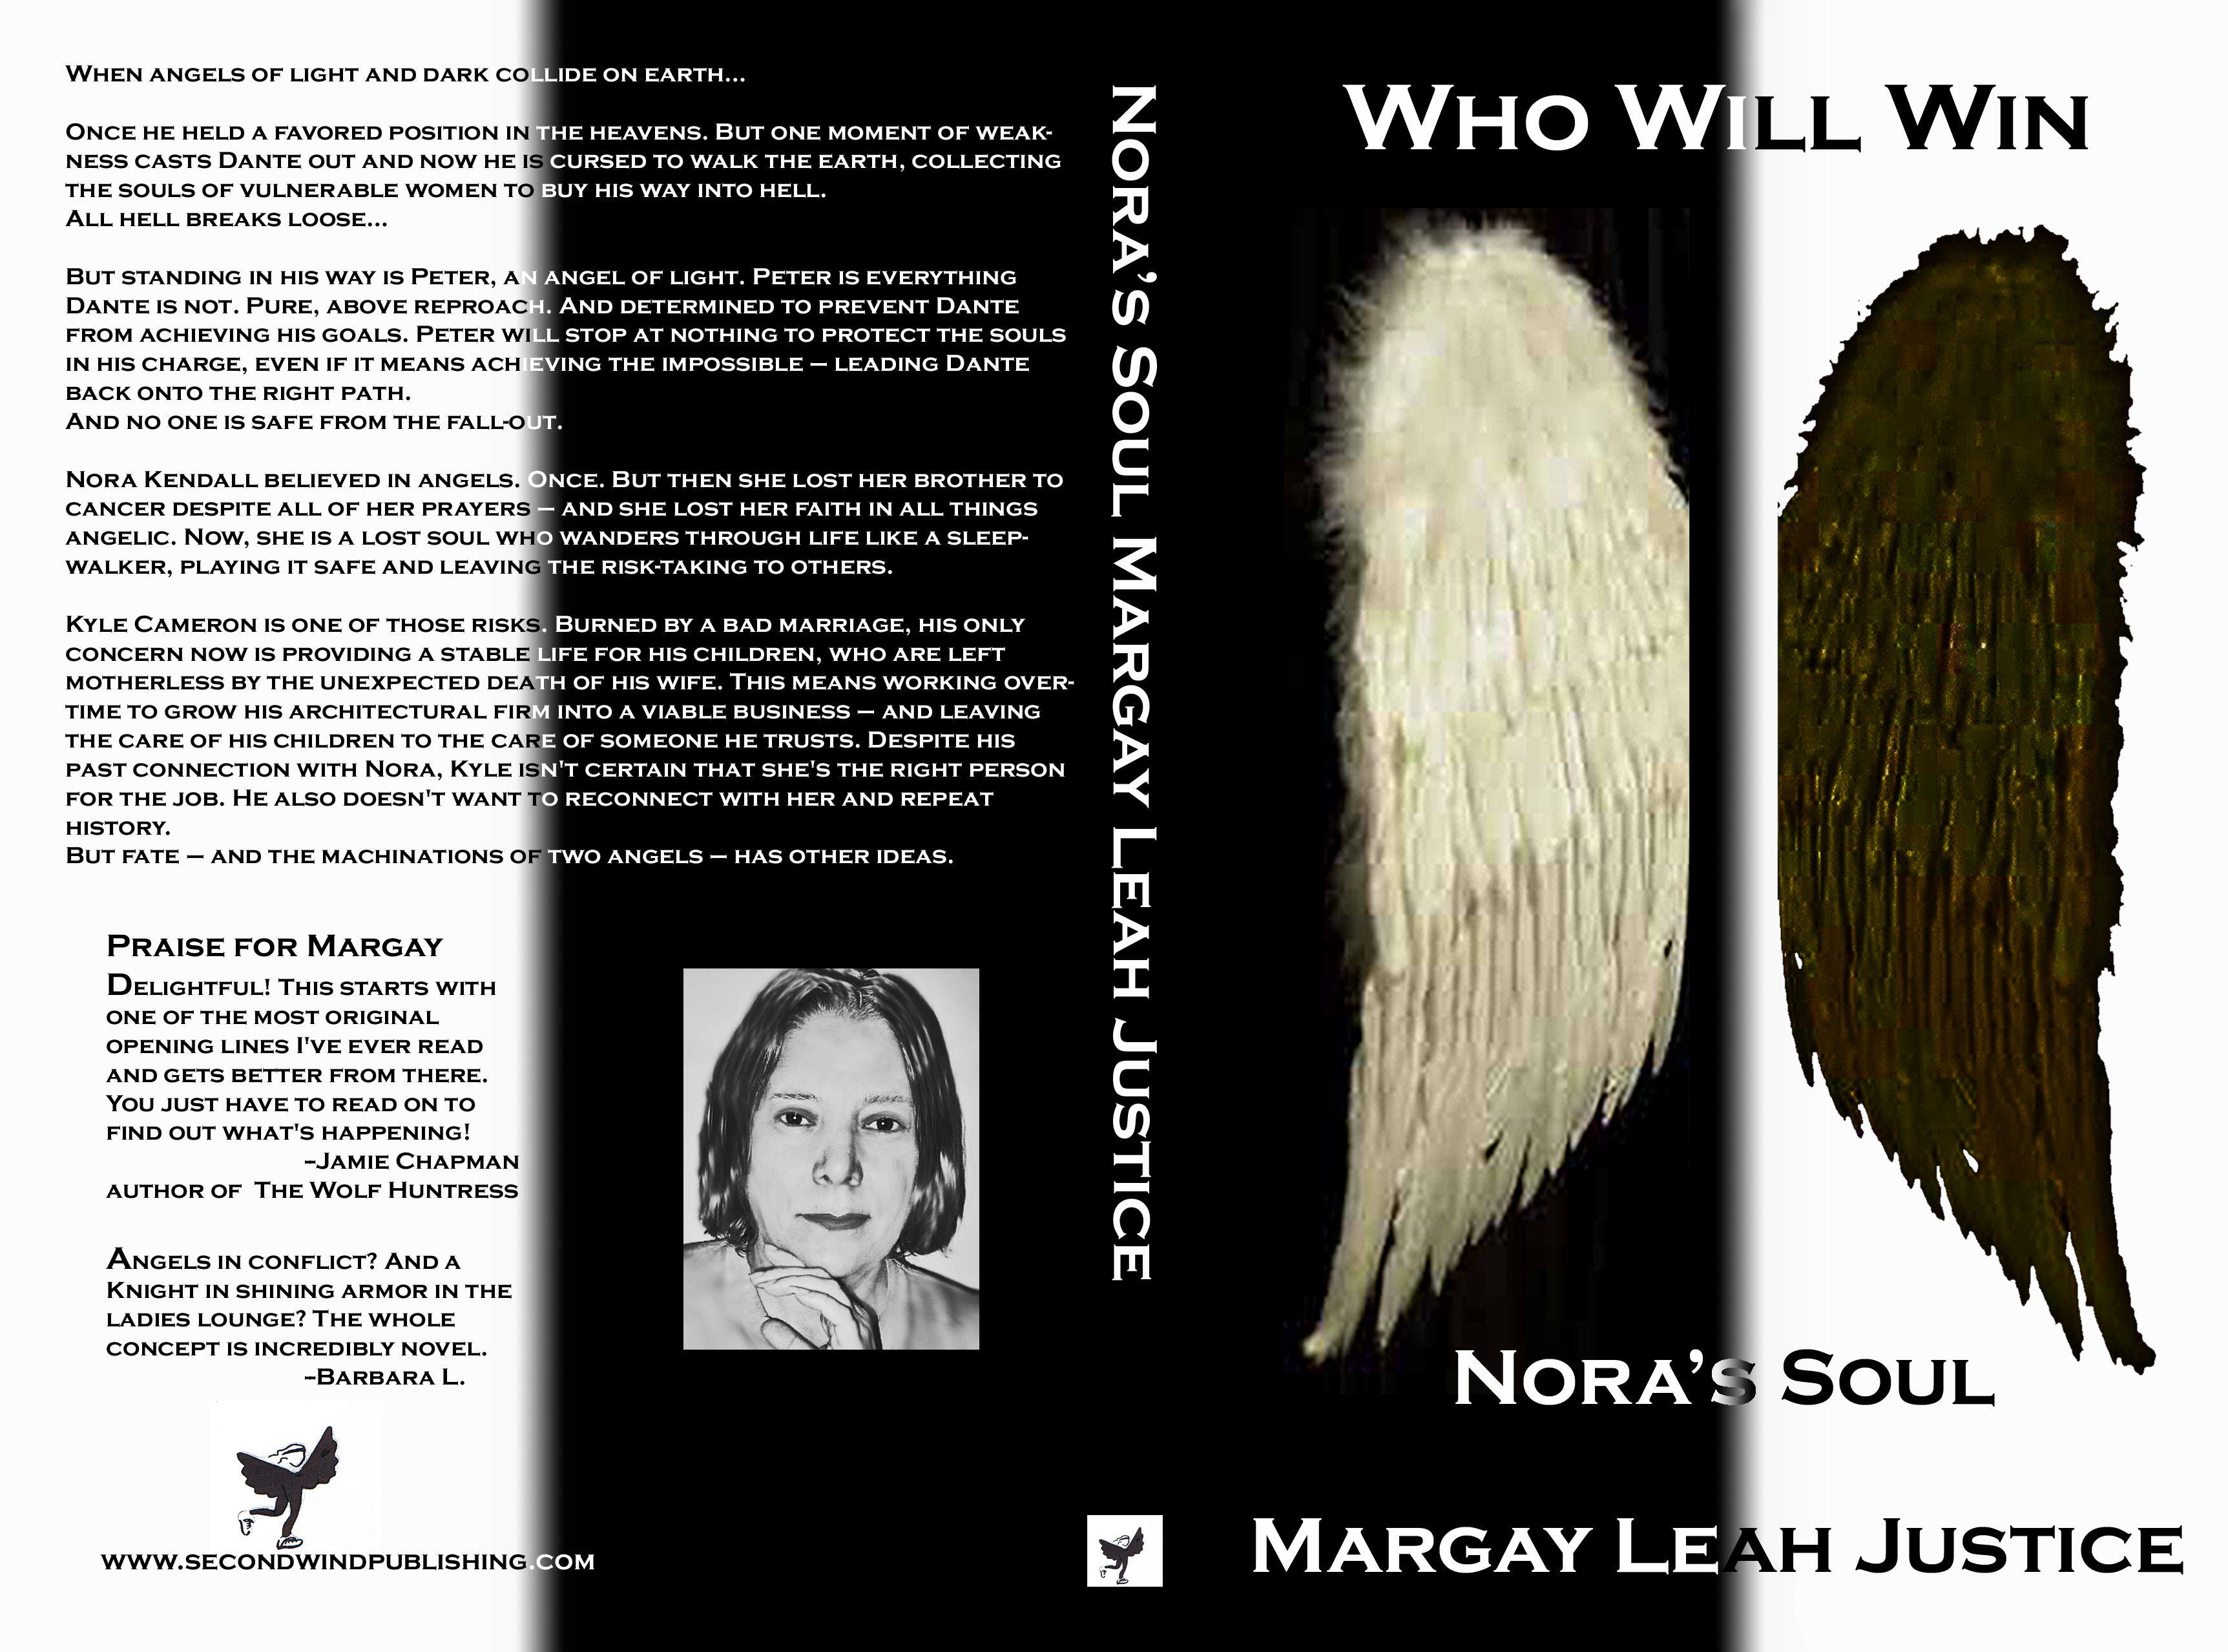 Margay Leah Justice's Nora's Soul - Original Cover 2008 Order your own cover:  http://suzettevaughn.wix.com/suzettevaughn#!author-advice--assistance/c22hz